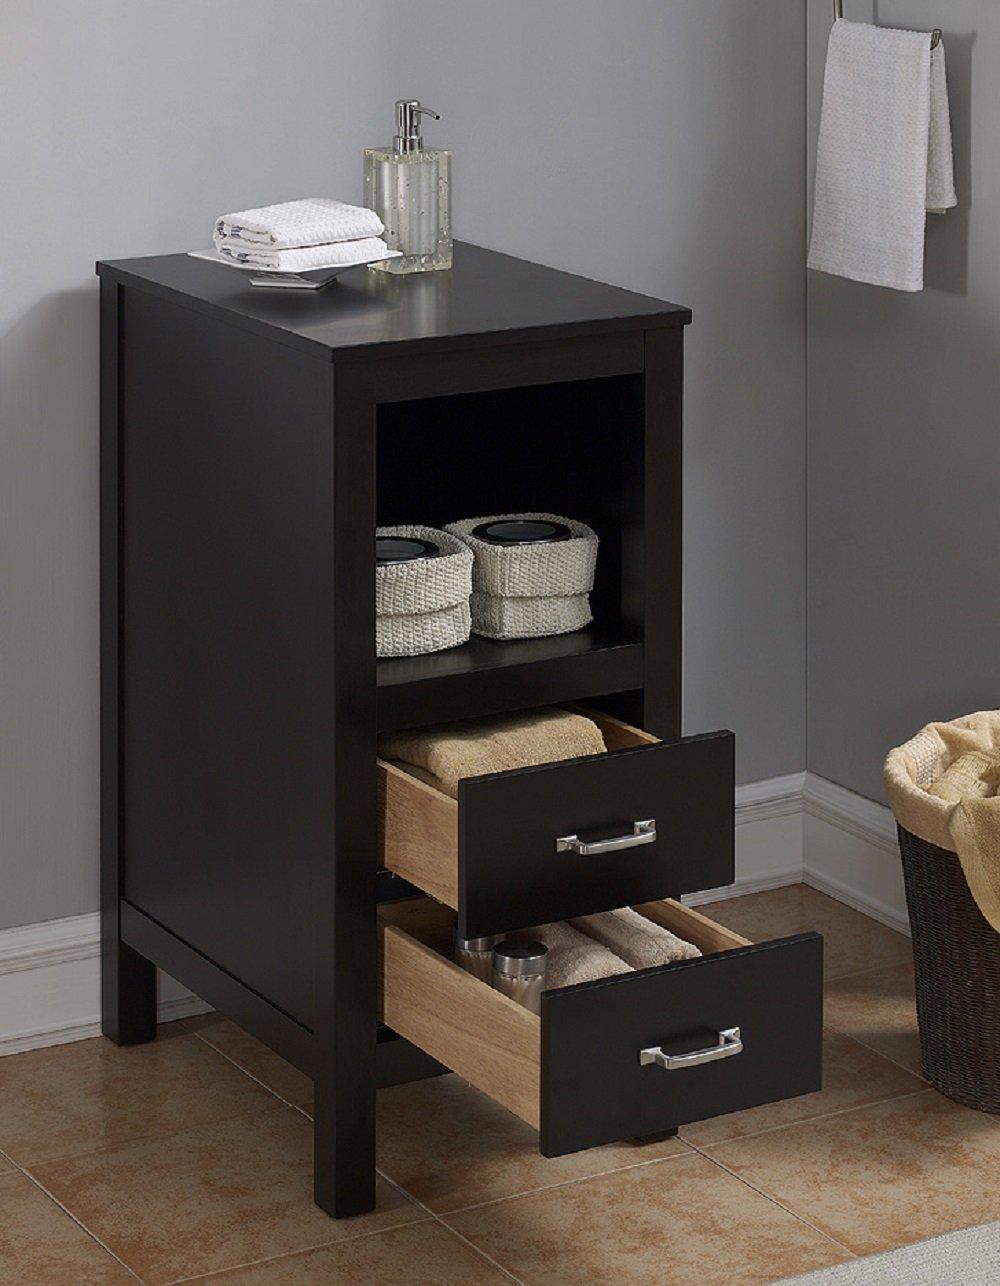 Espresso Runfine Groups RunFine RFVAB0002F Matching Floor Cabinet for Vanity Finish Wood 15.625 x 21.5 x 33.25